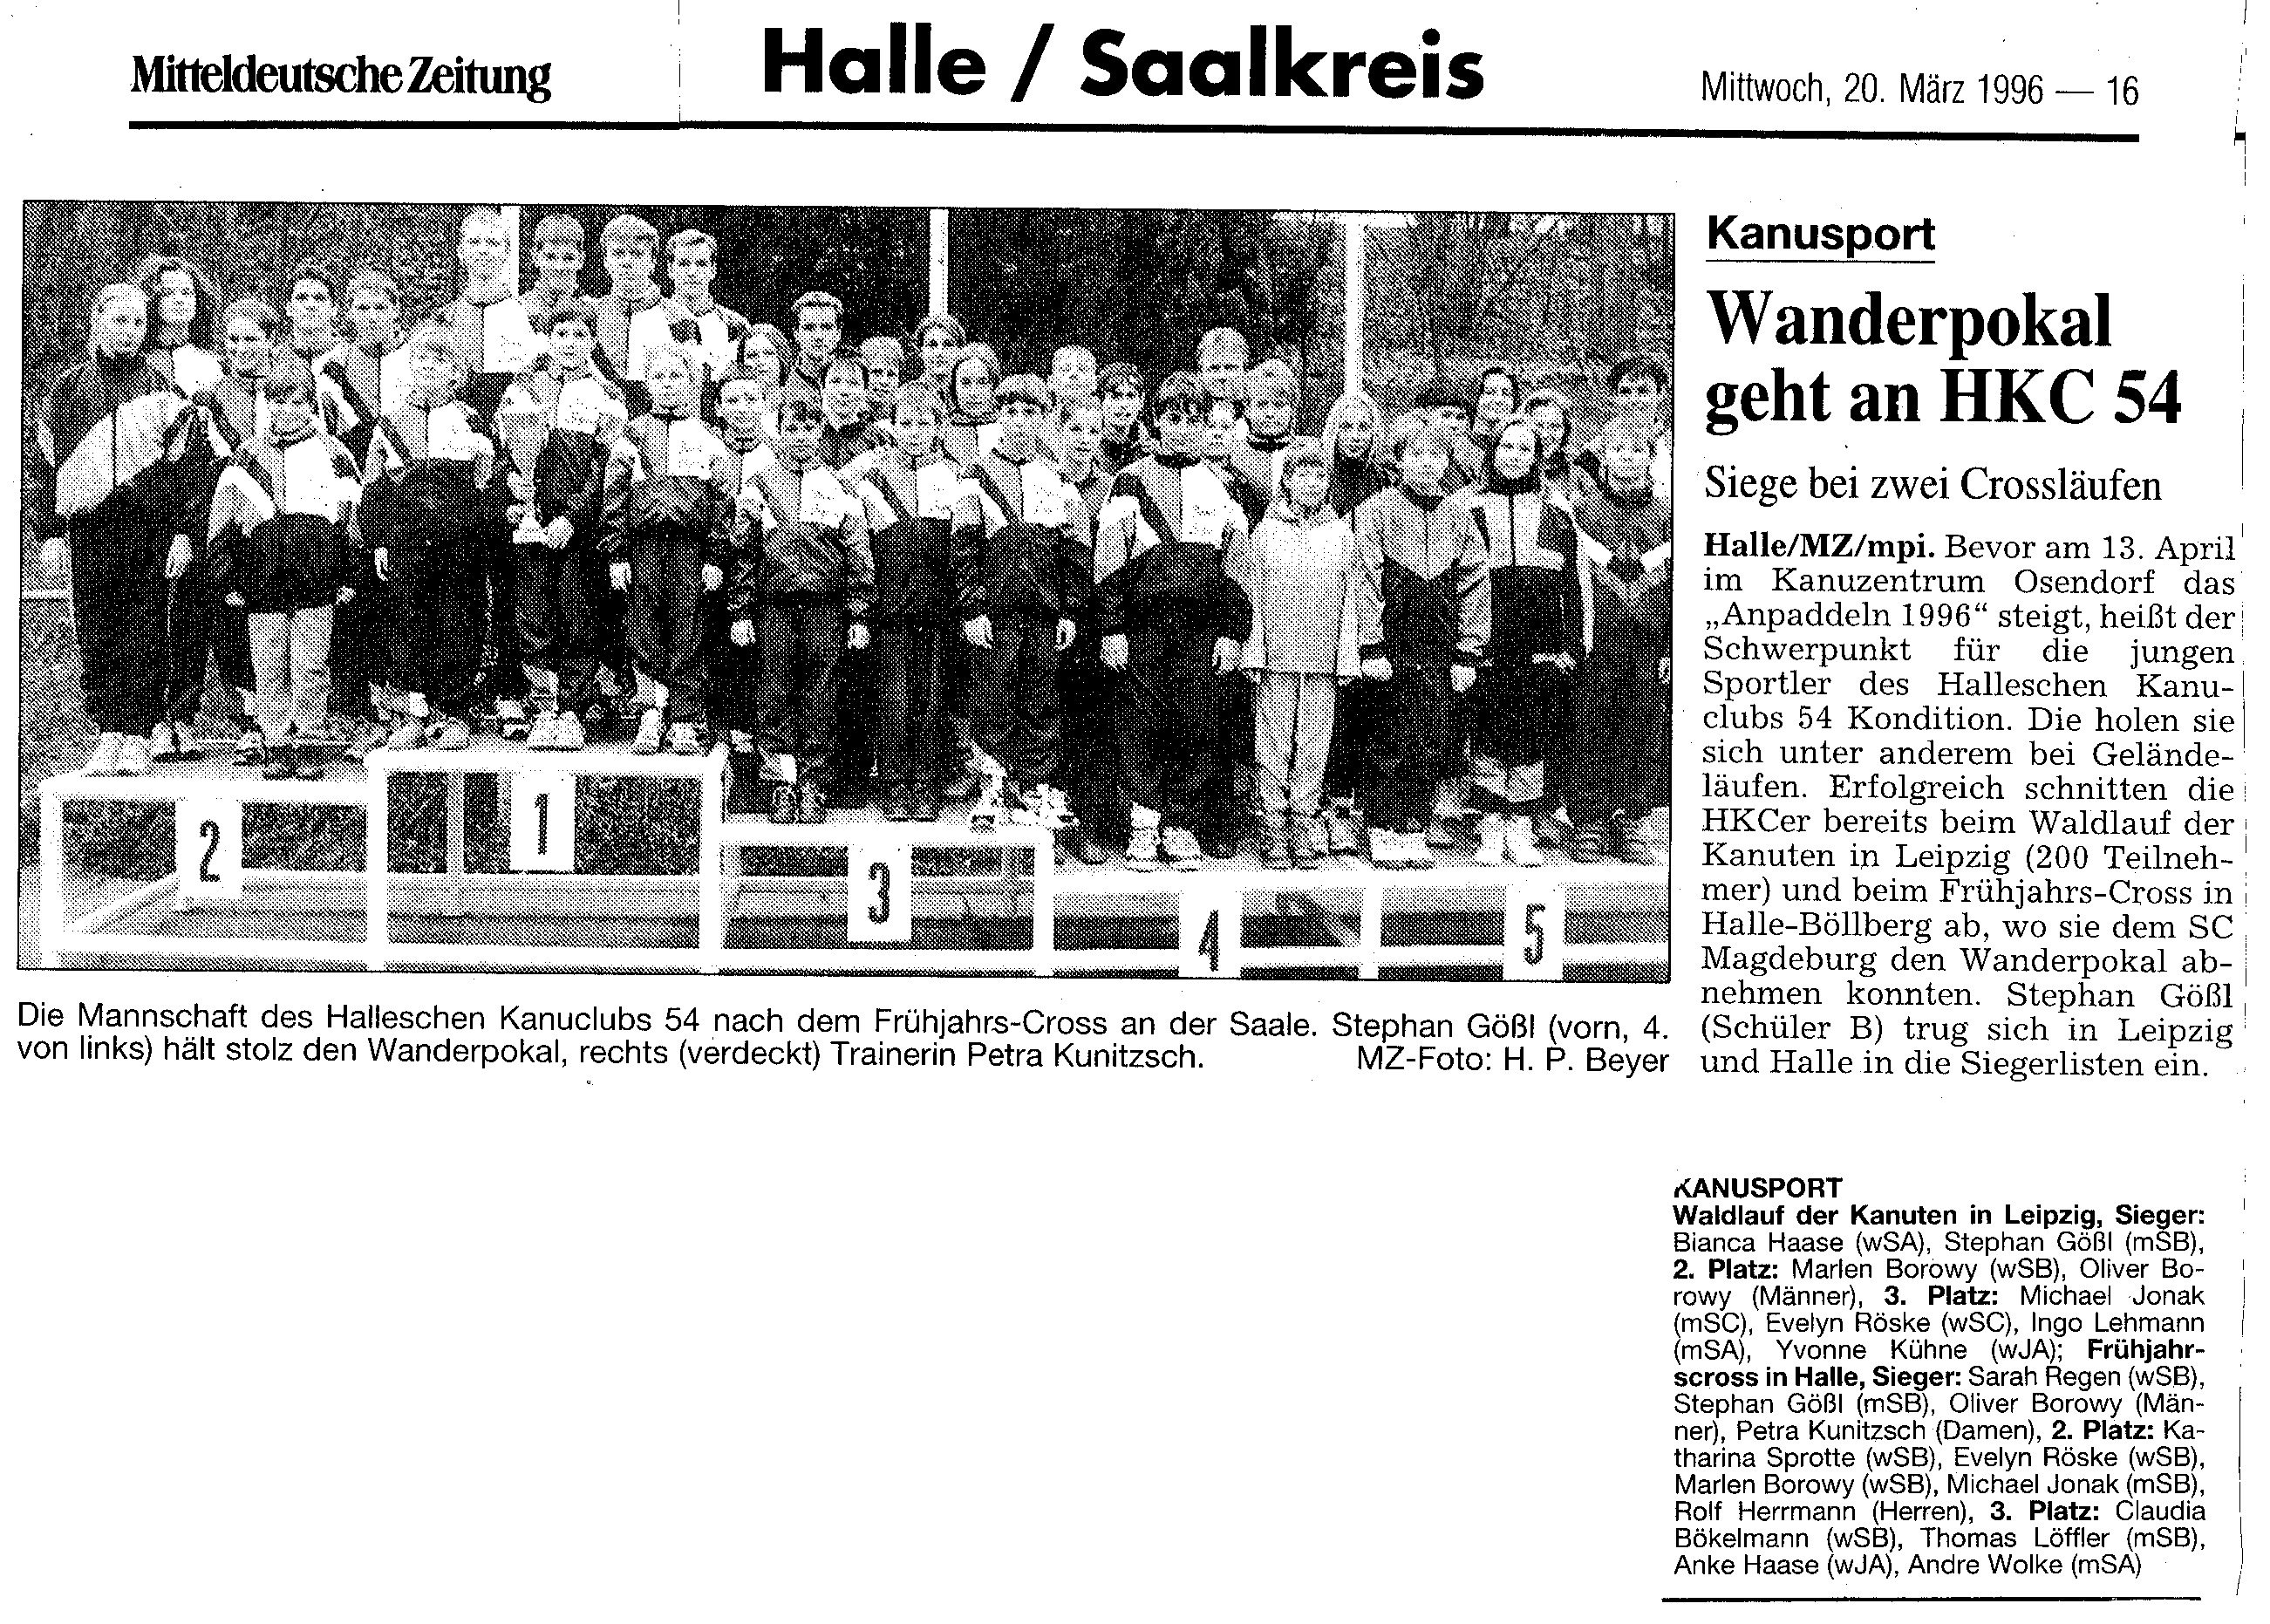 1996-03-20 MZ Wanderpokal geht an HKC 54